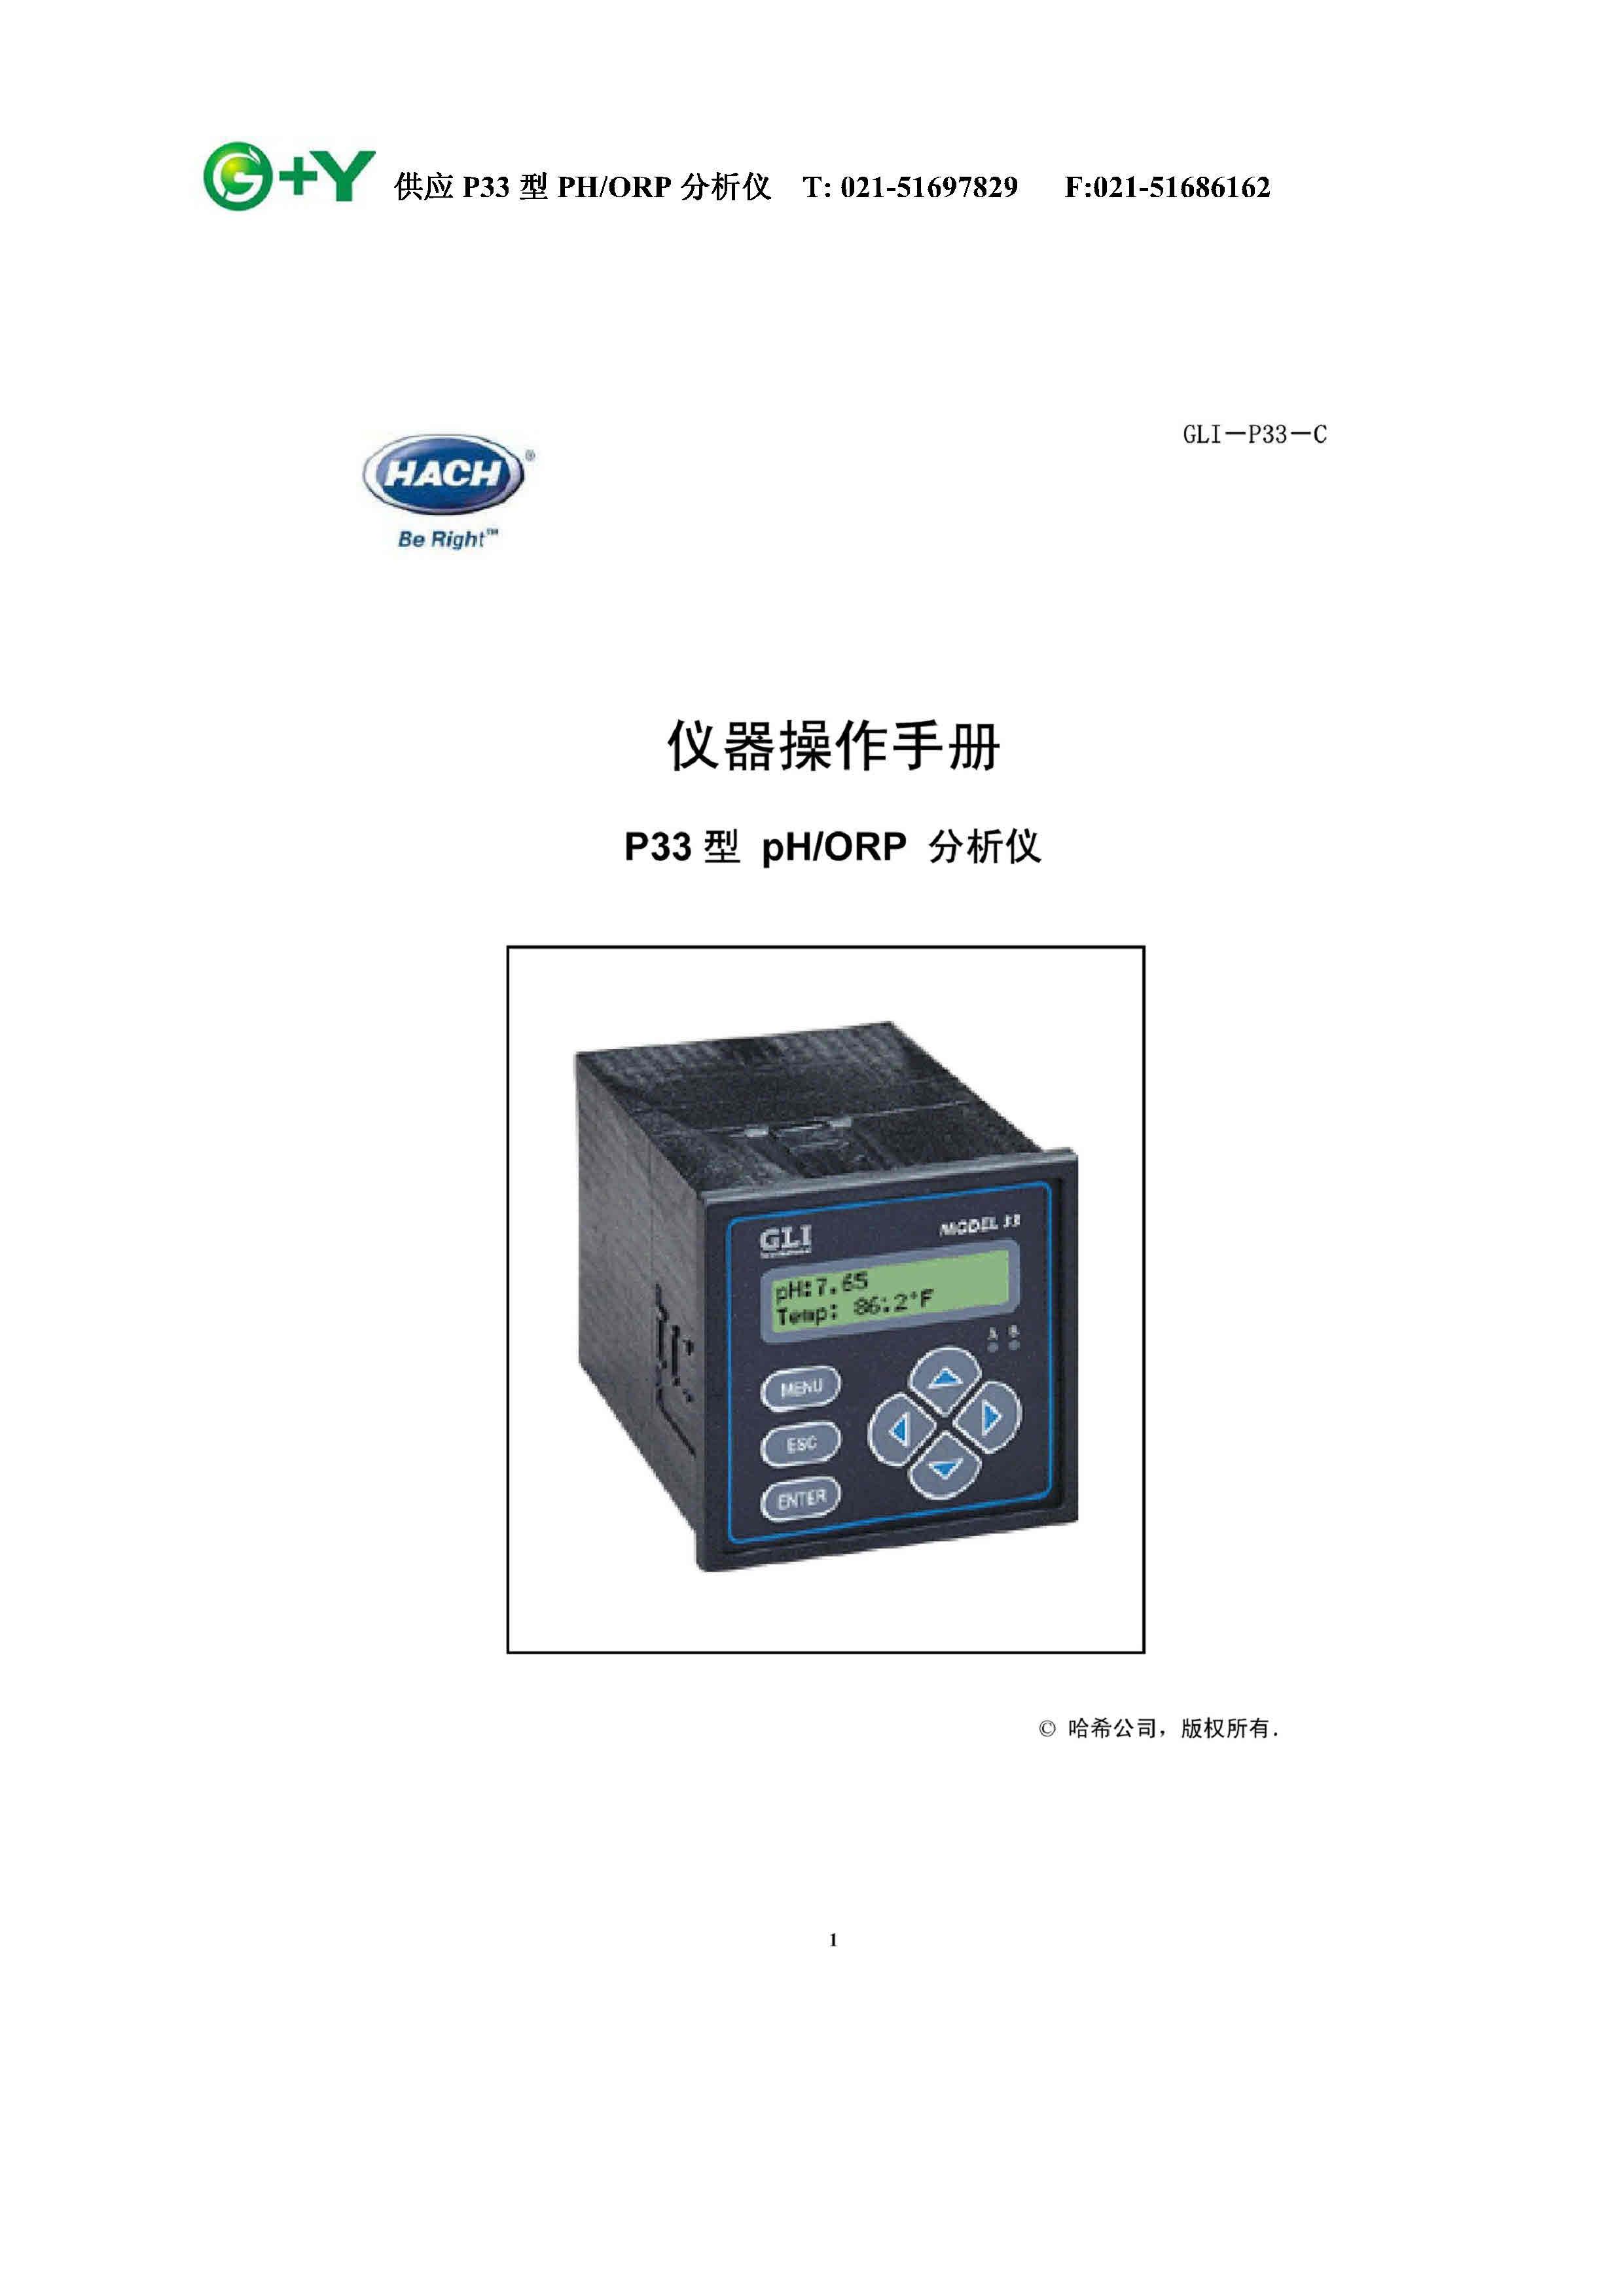 HACH GLI_MODELP33中文操作说明书